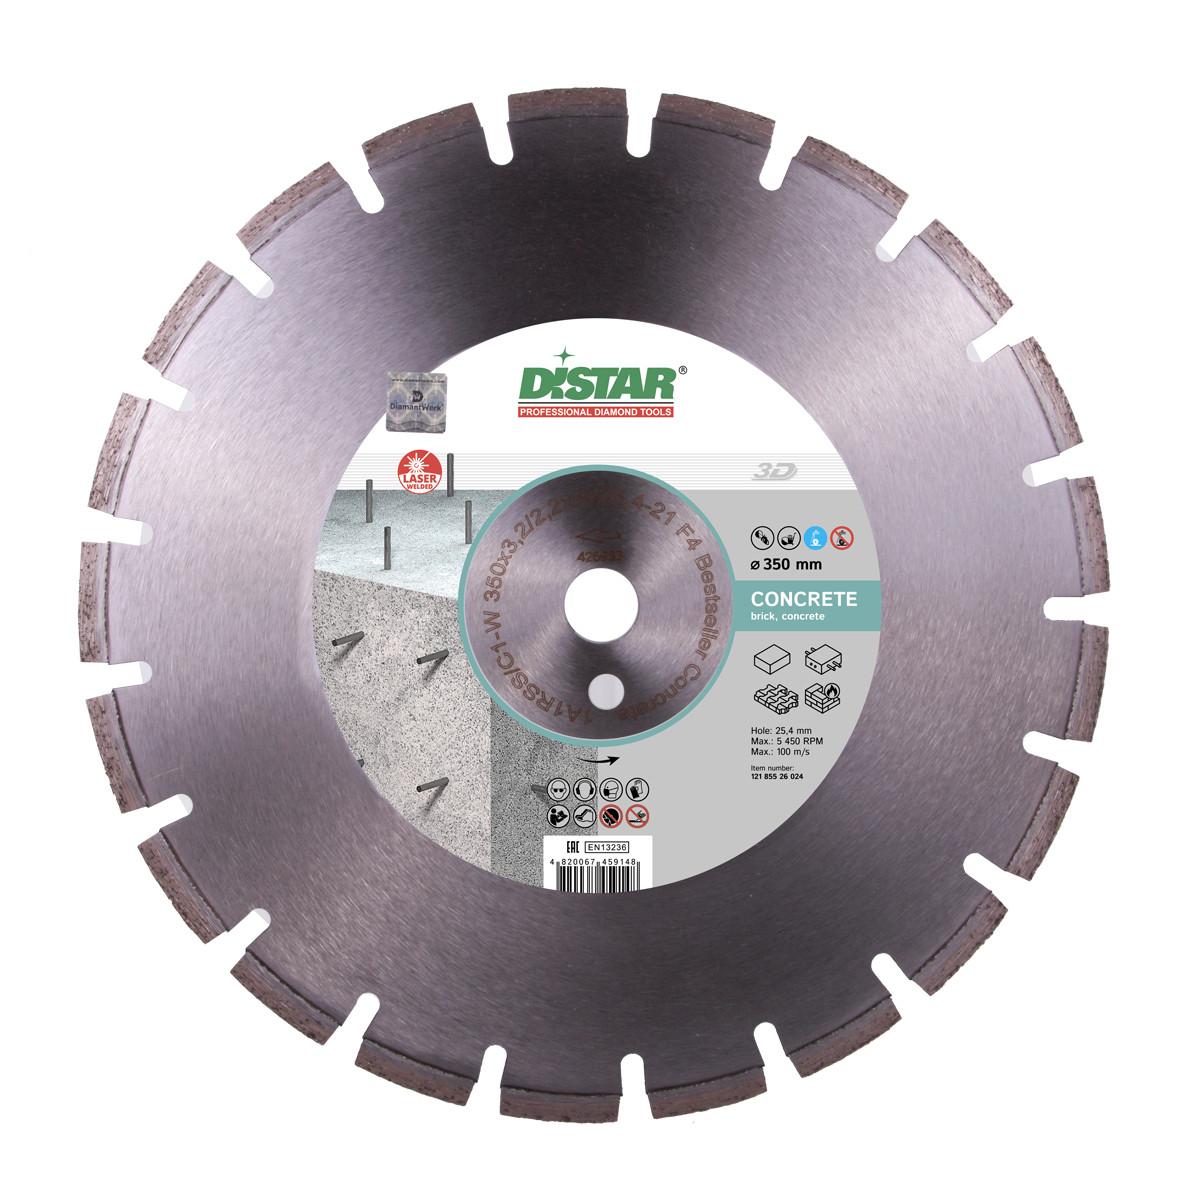 Диск алмазный Distar 1A1RSS/C1-W 600x4,5/3,5x9x25,4-36 F4 Bestseller Concrete